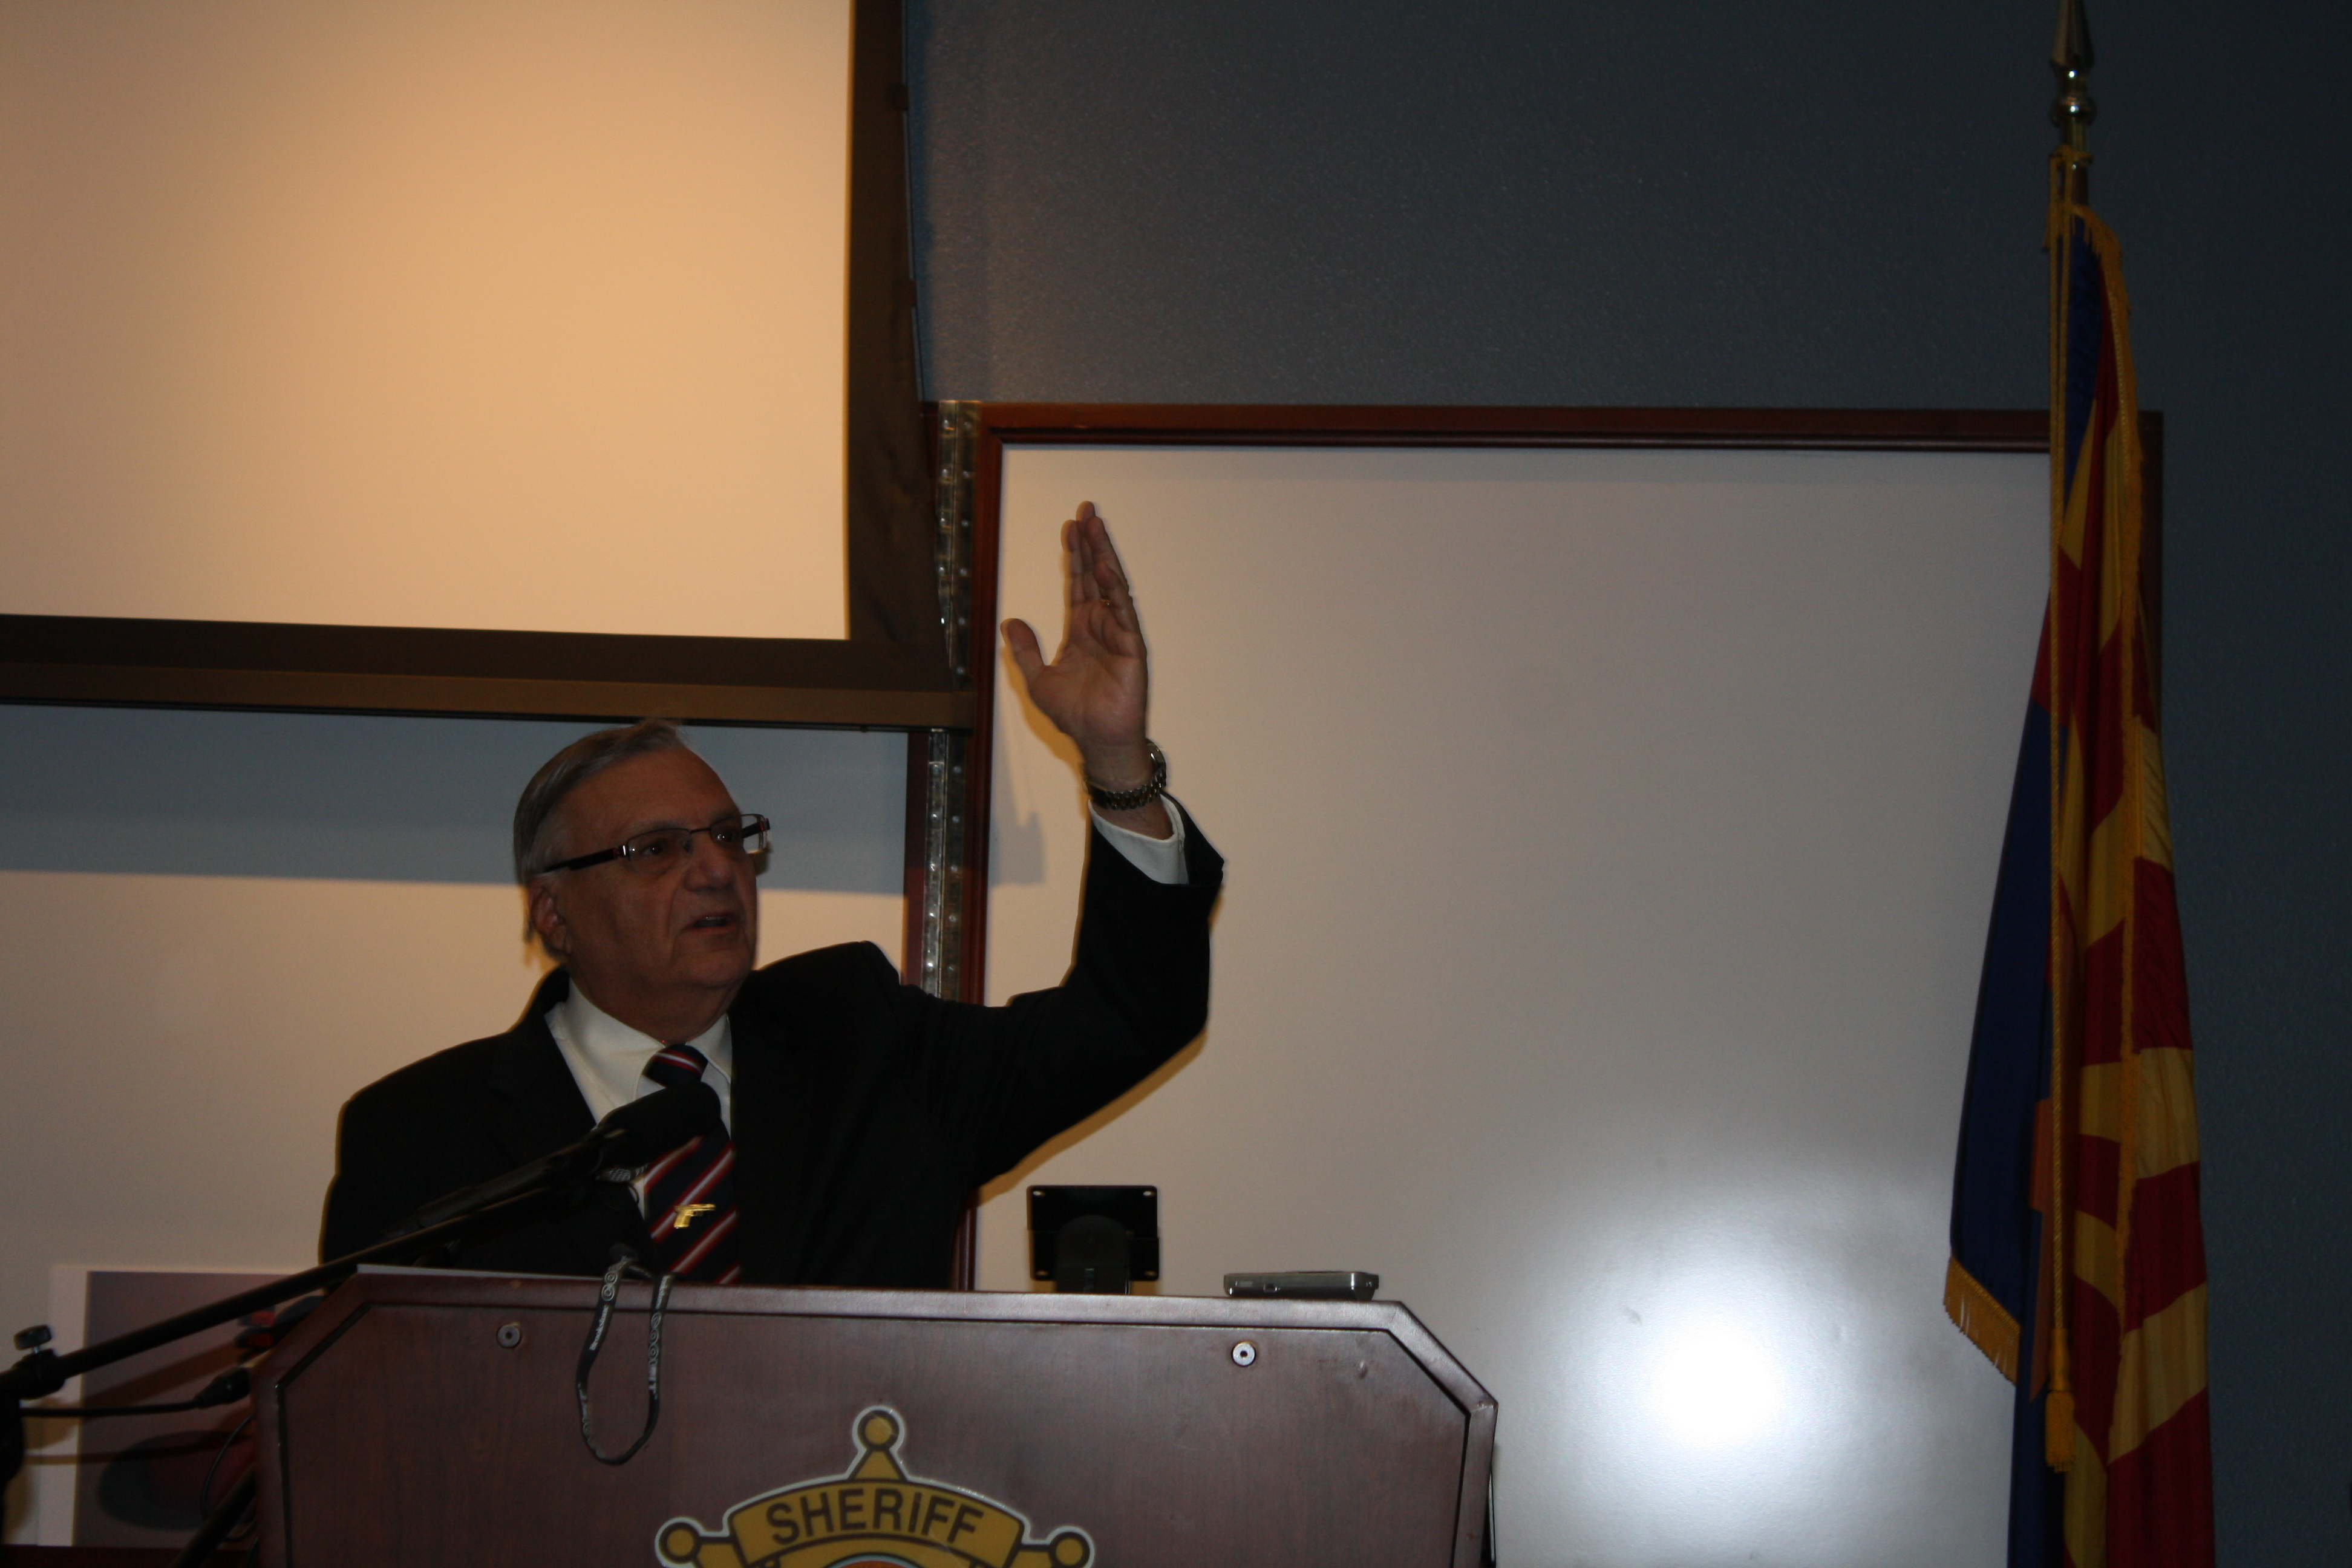 Sheriff Joe Arpaio Conference 1 SC